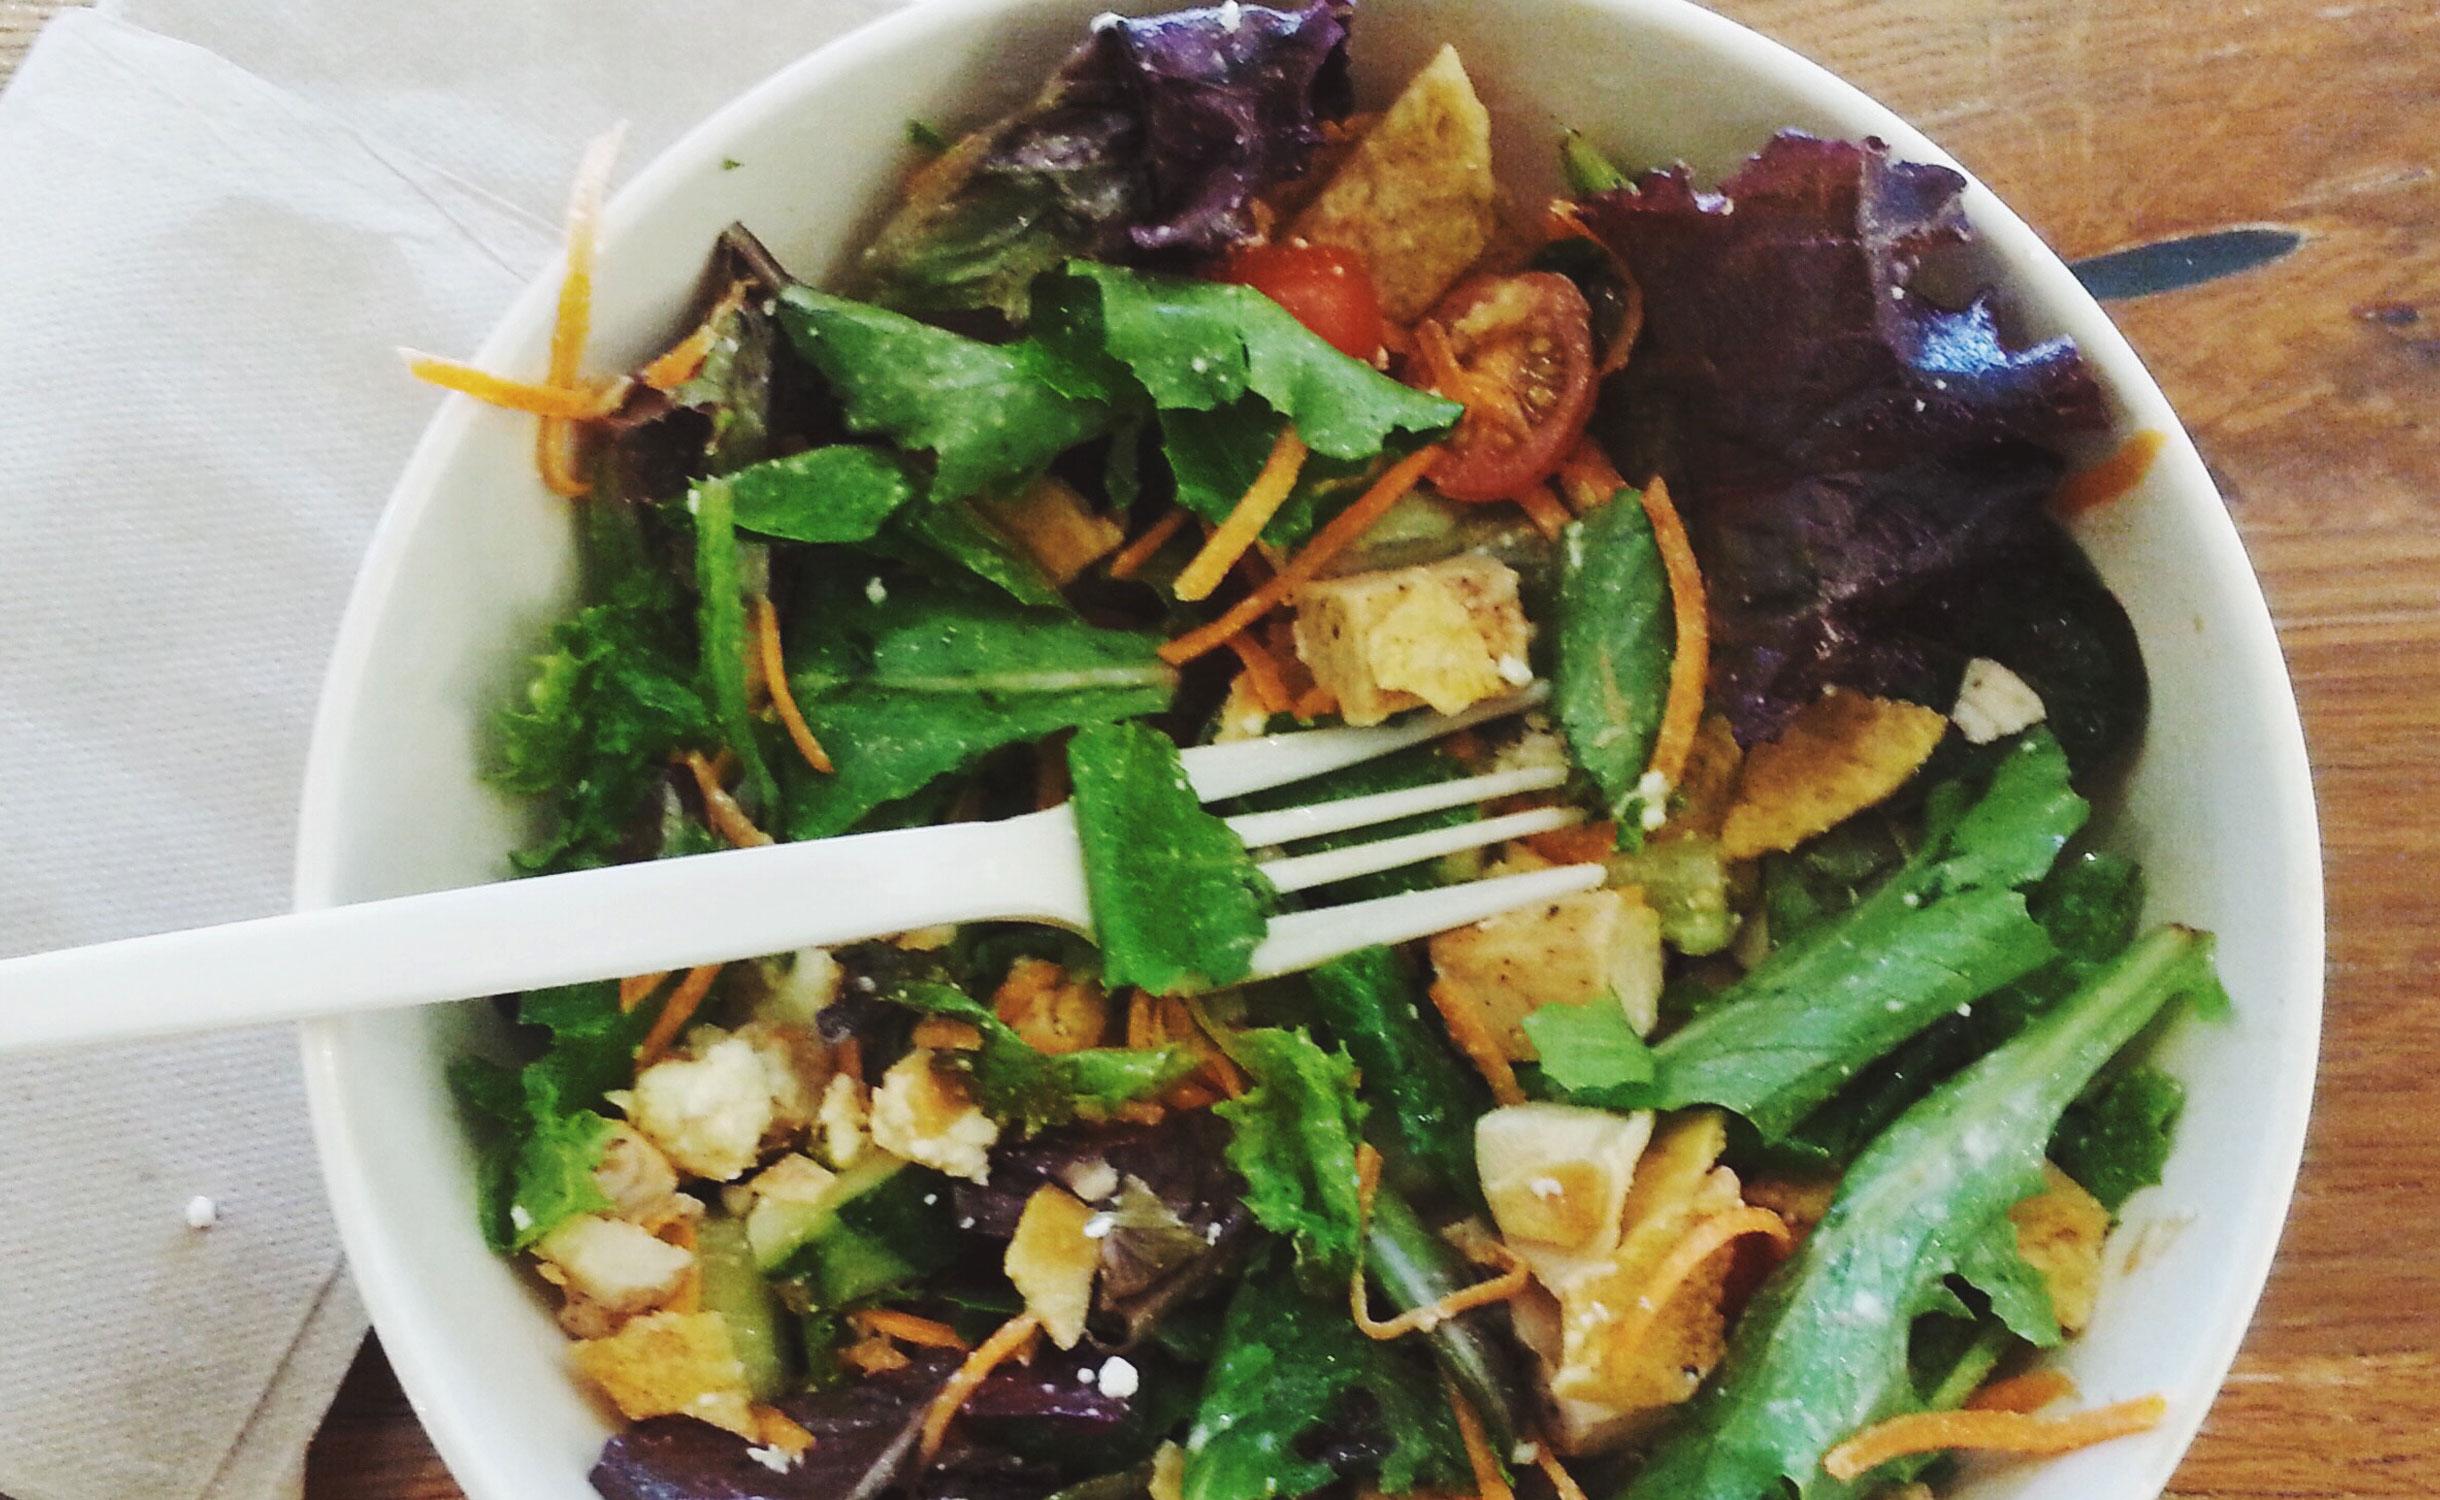 Blattsalat Mit Geröstetem Gemüse Lgv Frischgemüse